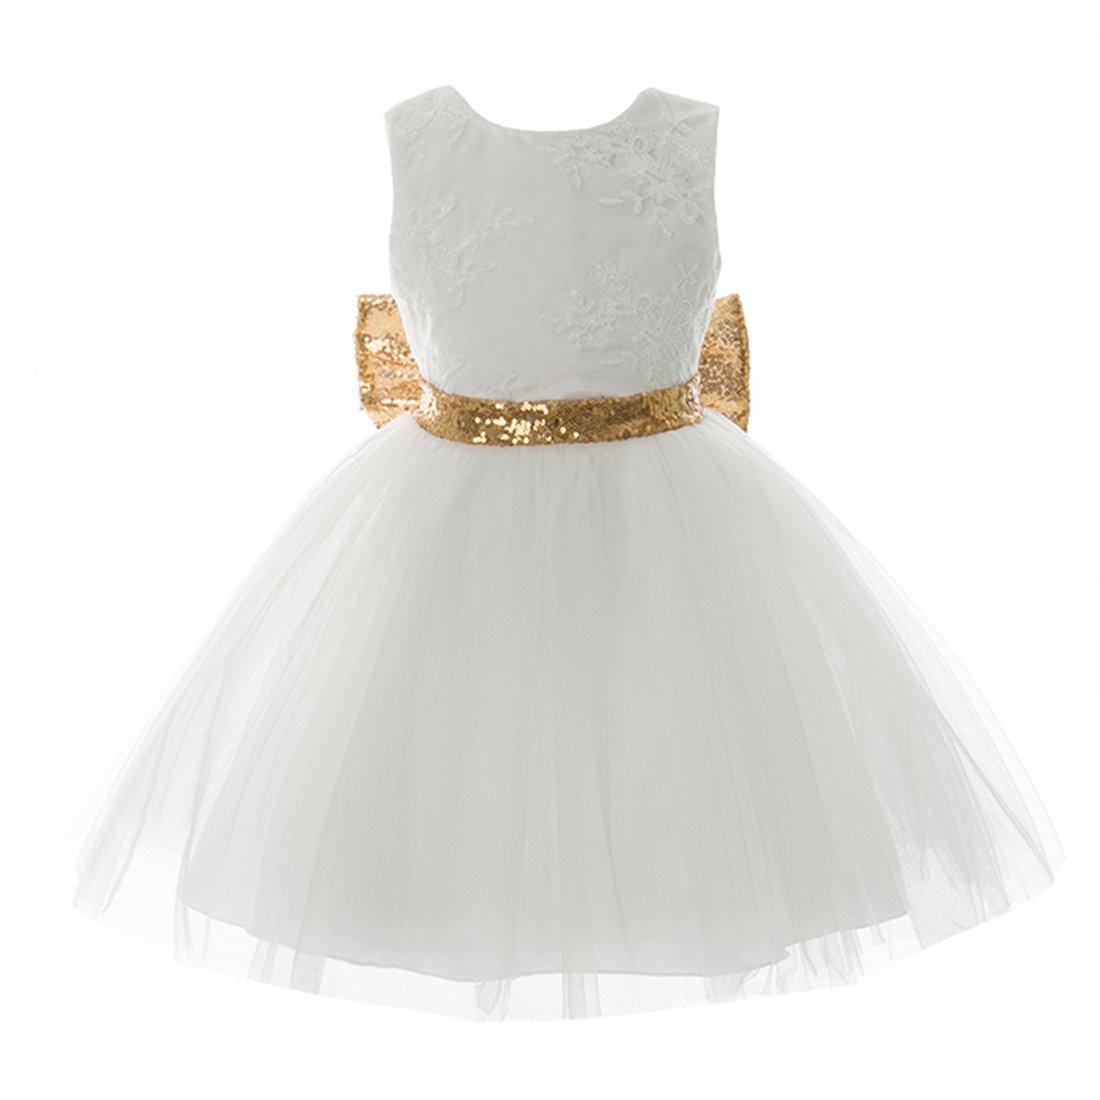 Inlefen Girls Bowknot Lace Princess Gonna Paillettes Estate Abiti per Bebè Bambini 0-5 Anni